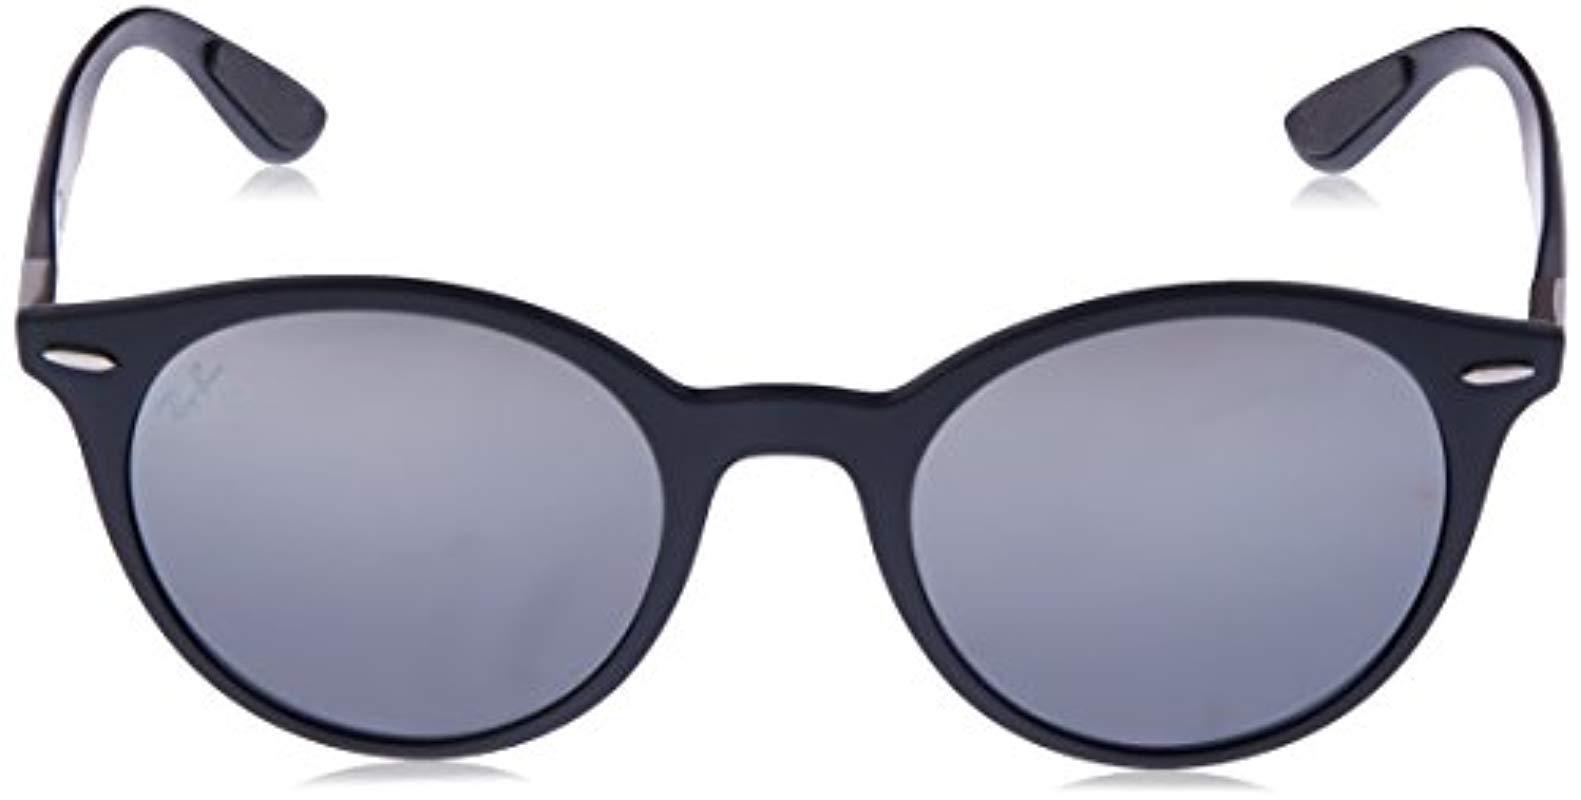 61959e9819 Ray-Ban - Gray Lightforce Round Sunglasses In Matte Dark Grey Rb4296 633288  51 for. View fullscreen